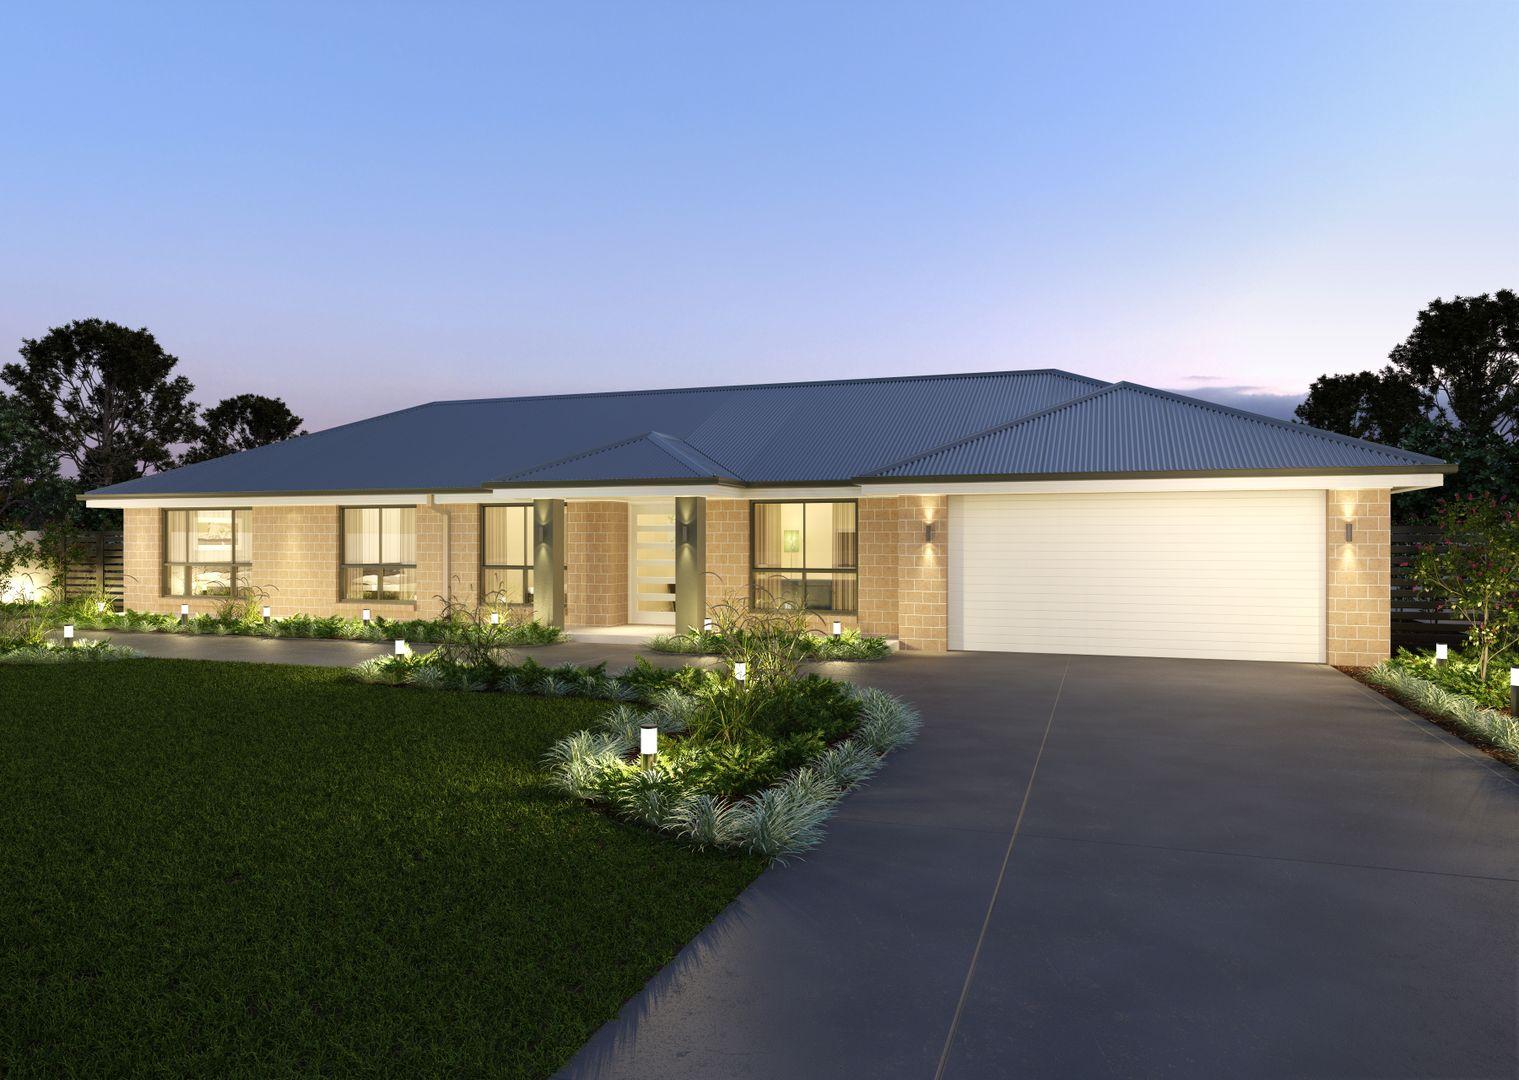 Lot 18 Sundowners Court, Sundowners Estate, Upper Caboolture QLD 4510, Image 0